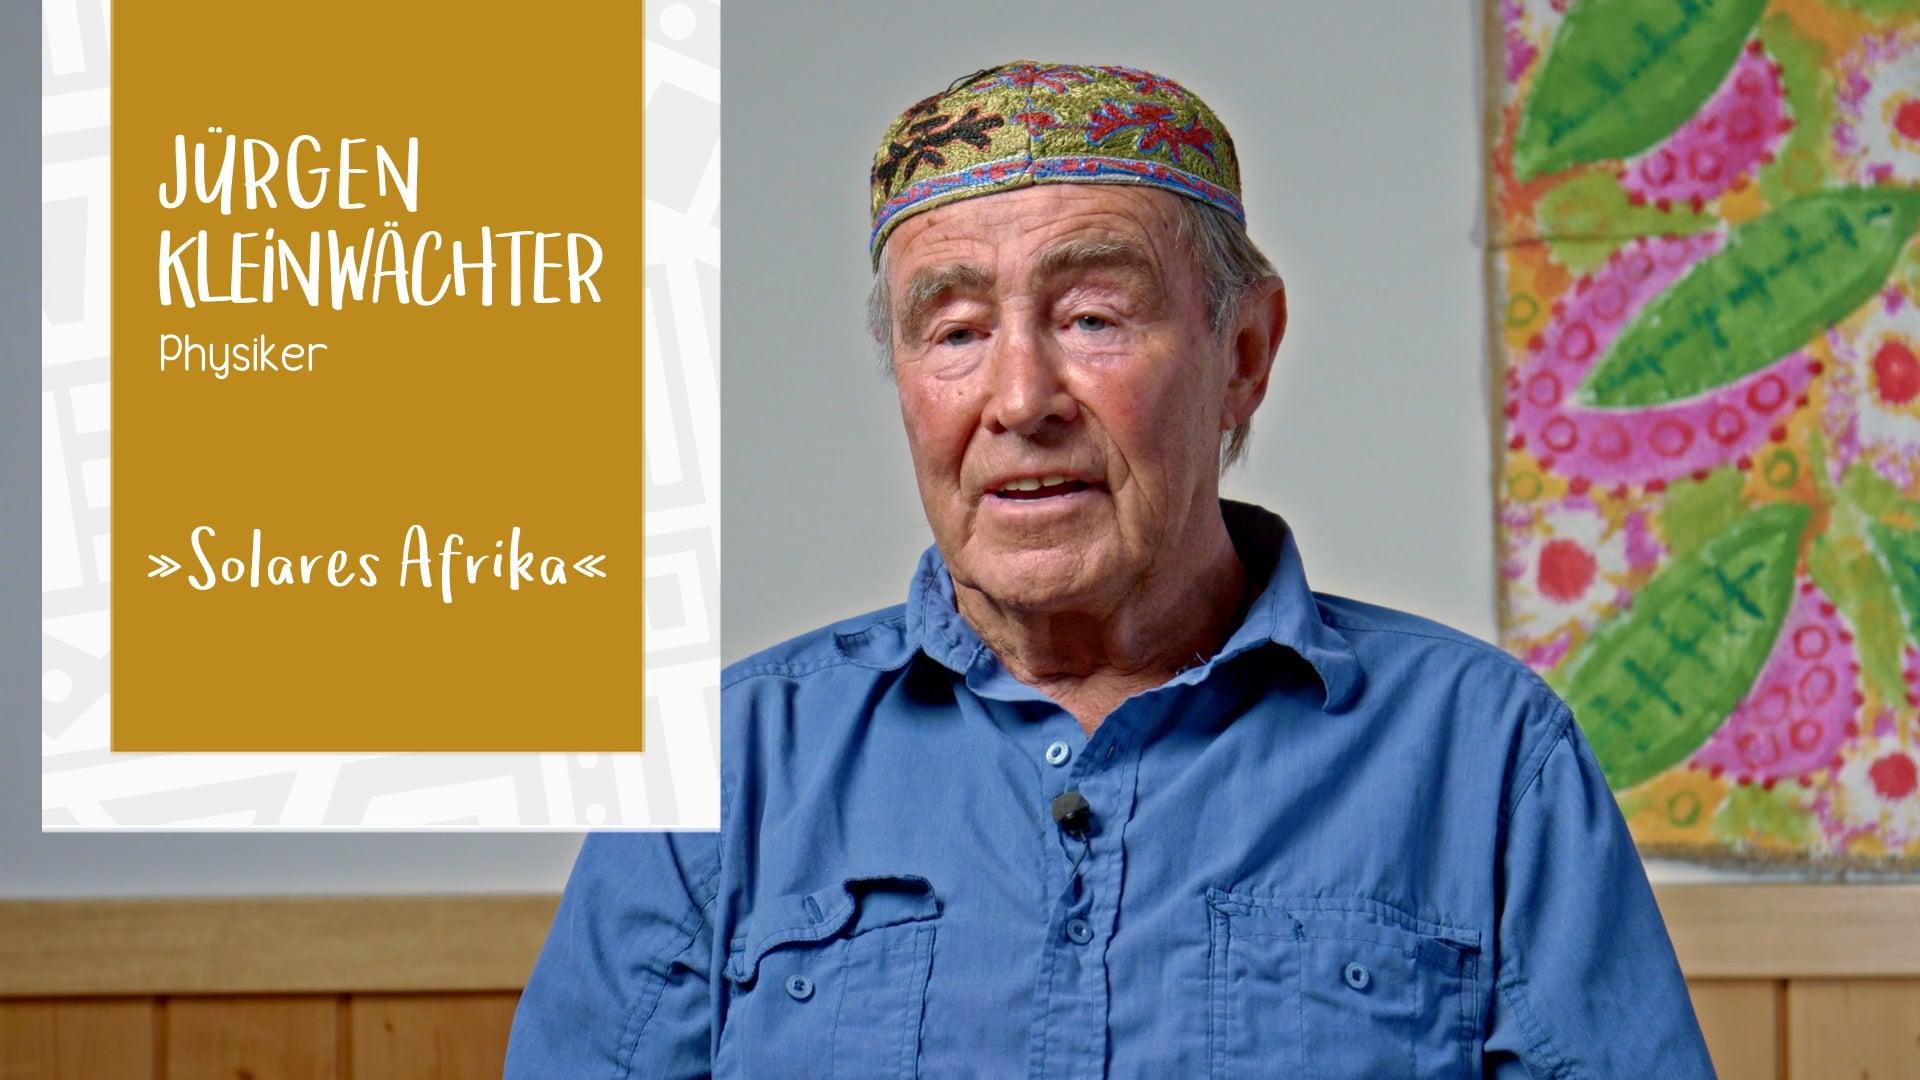 Jürgen Kleinwächter – Solares Afrika